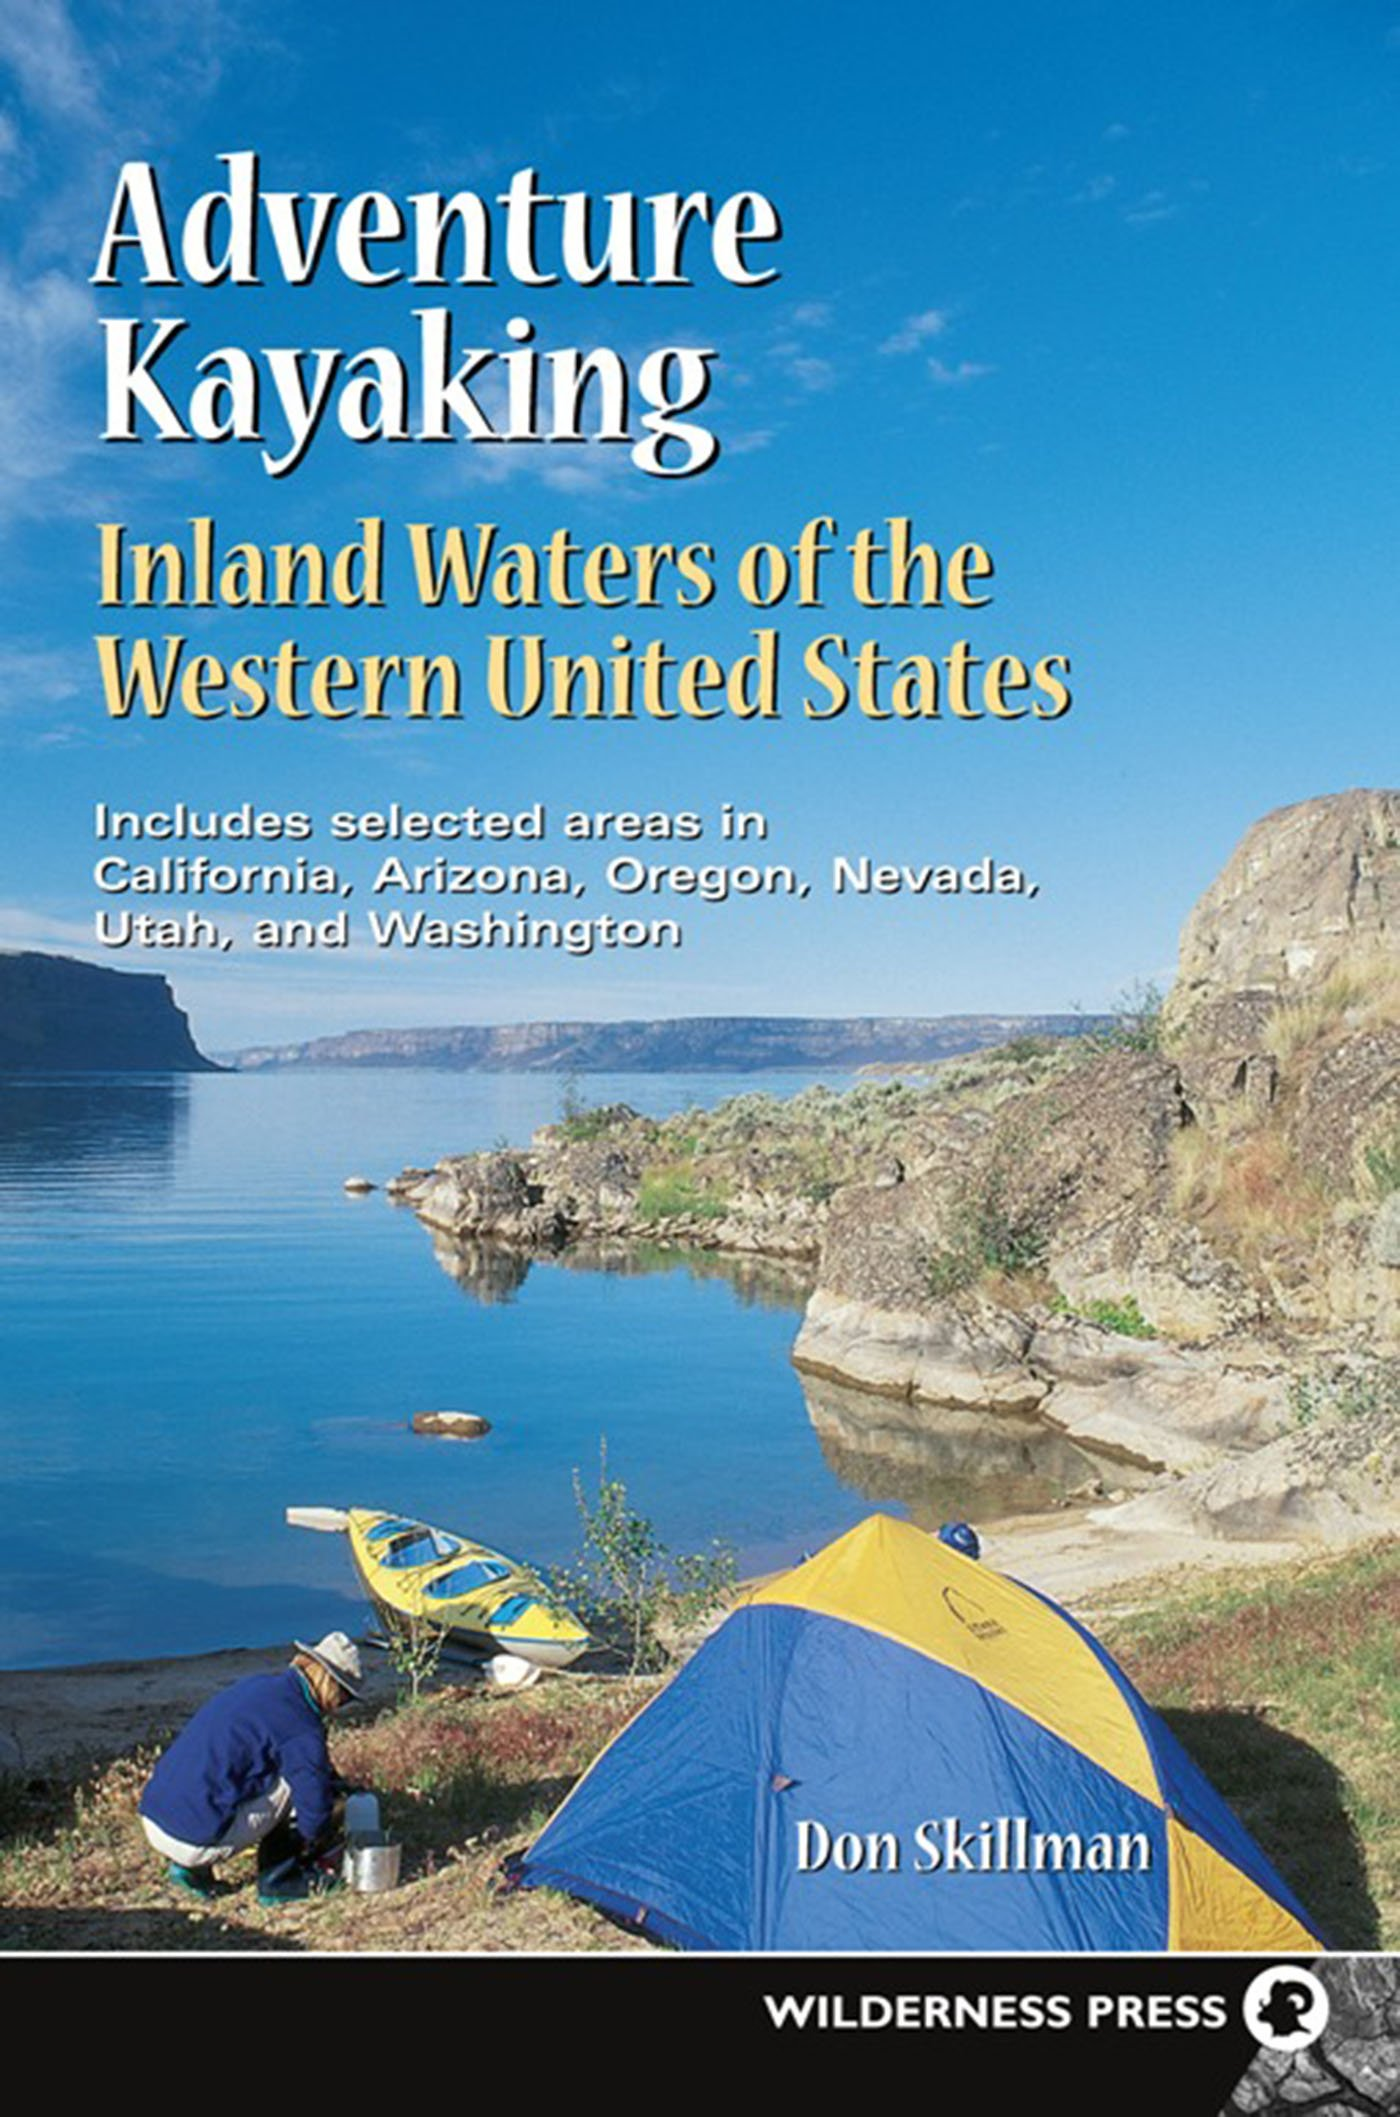 adventure kayaking inl and waters skillman don